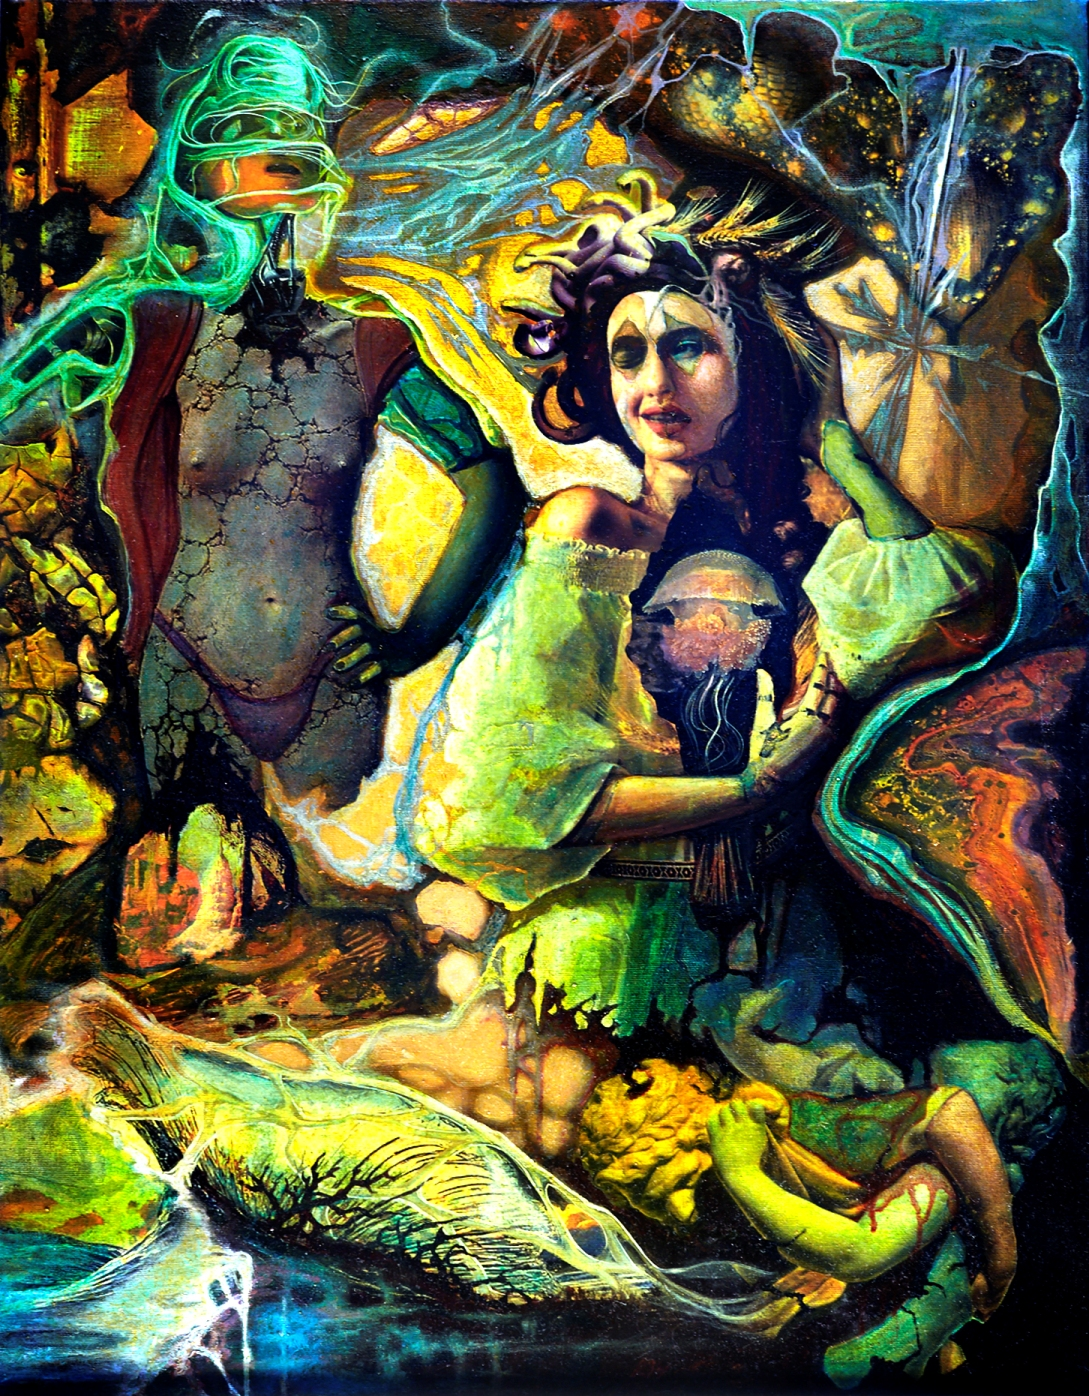 Mind-Boggling Neo-Surrealist Paintings by Cezar Ungureanu